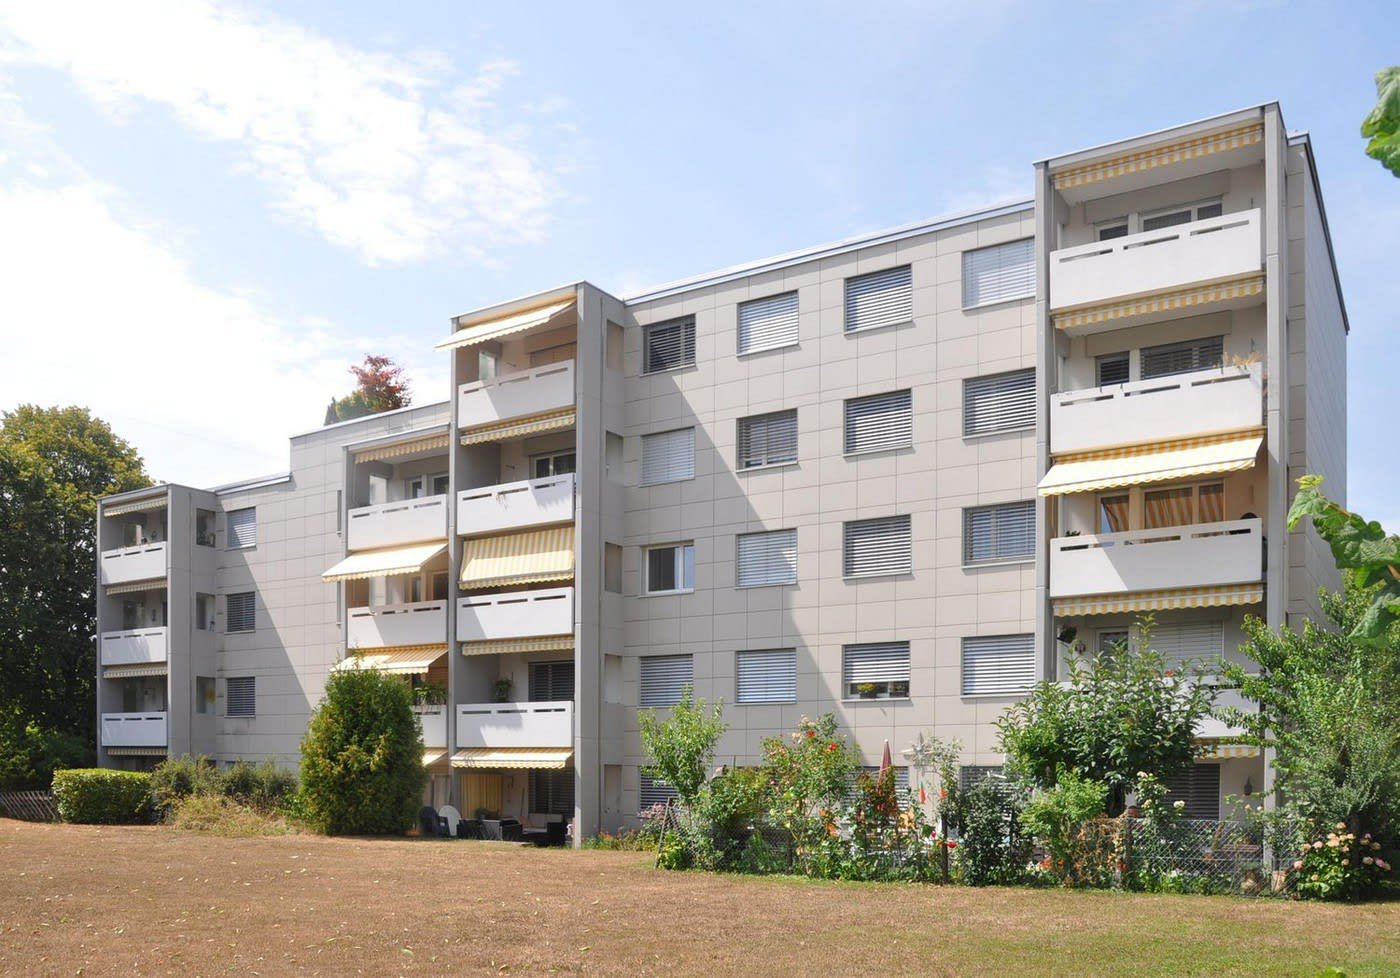 Bodenacherstrasse 39